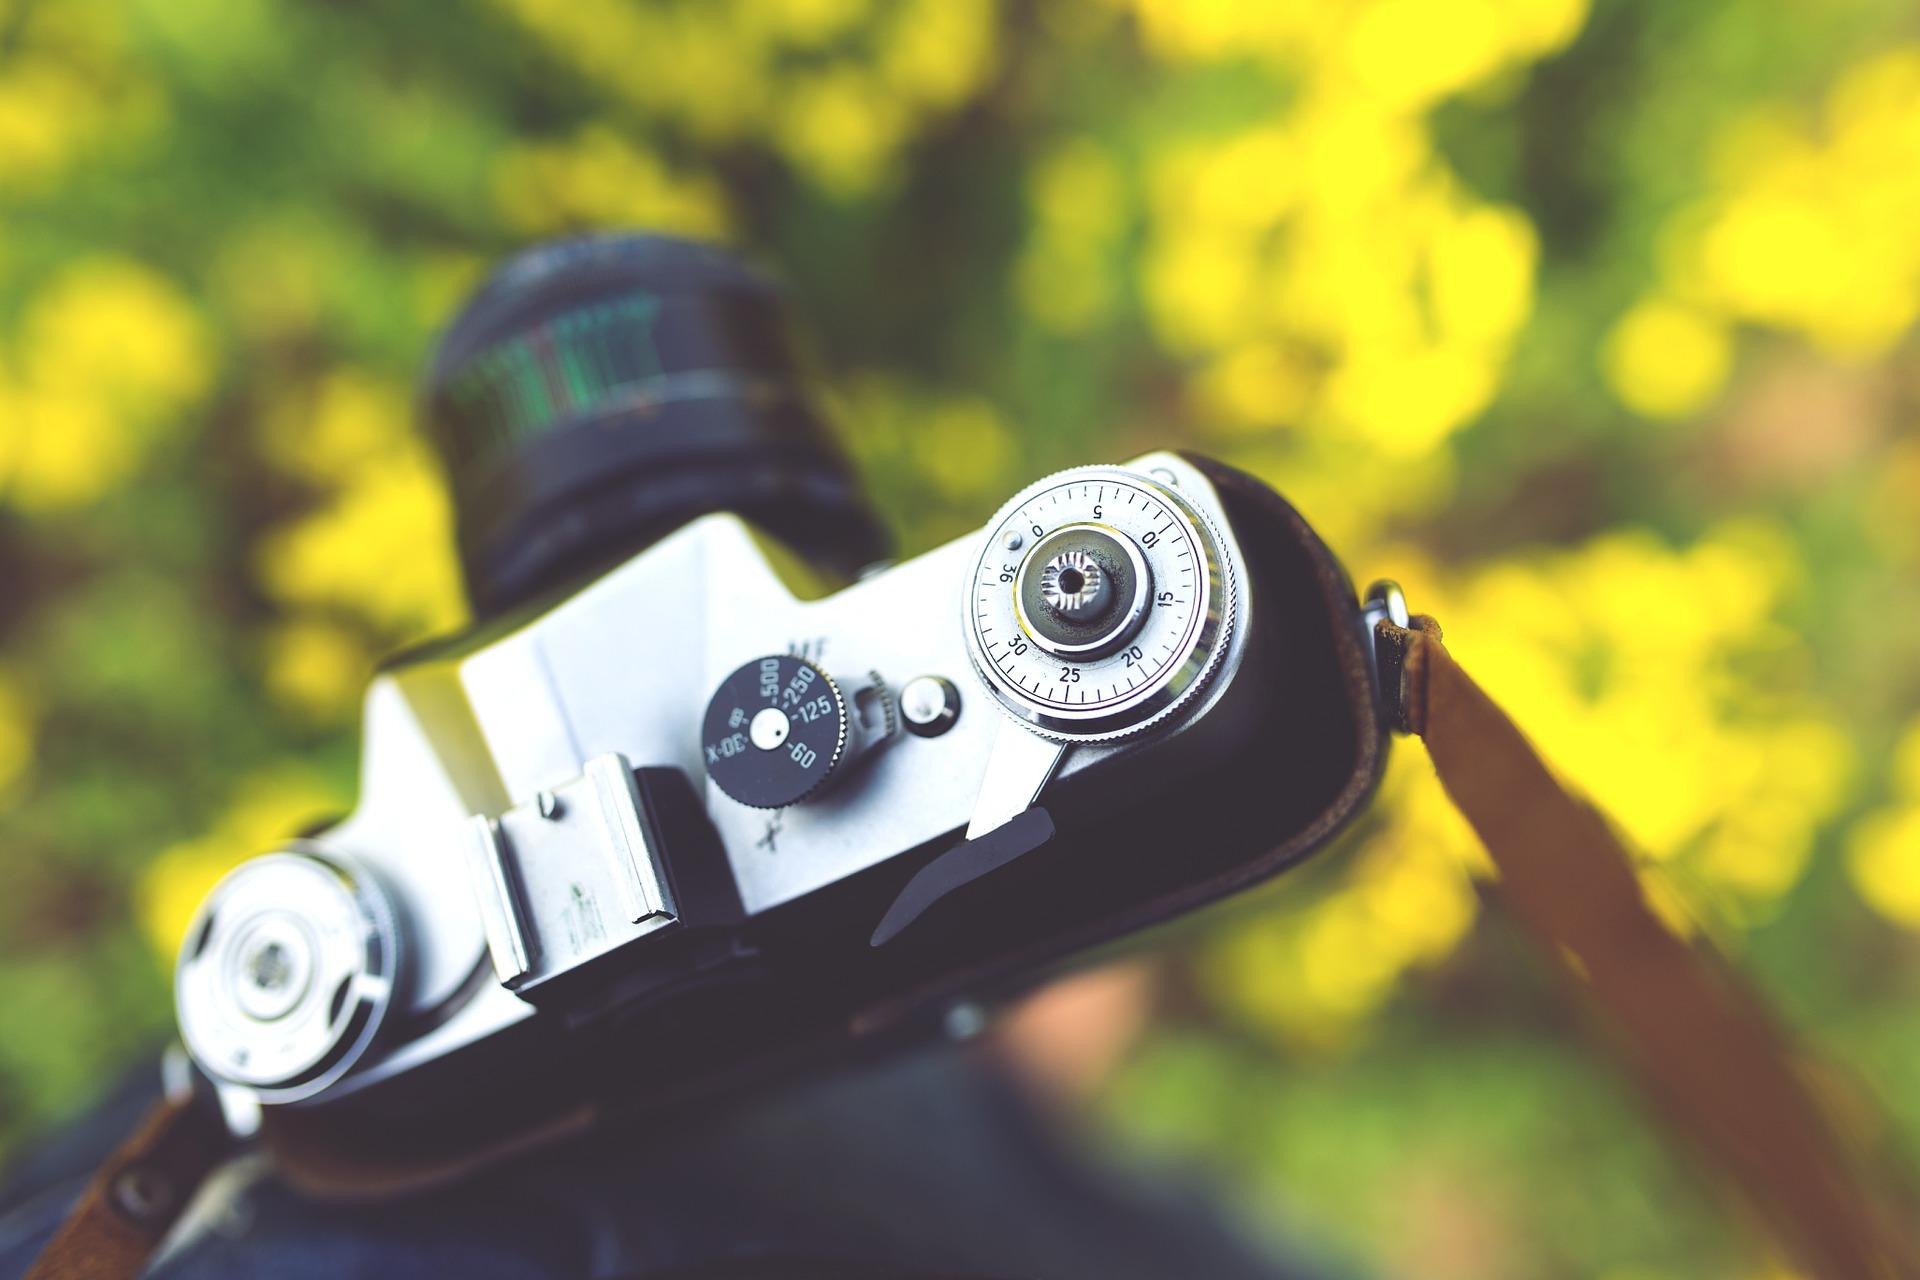 camera-791251_1920